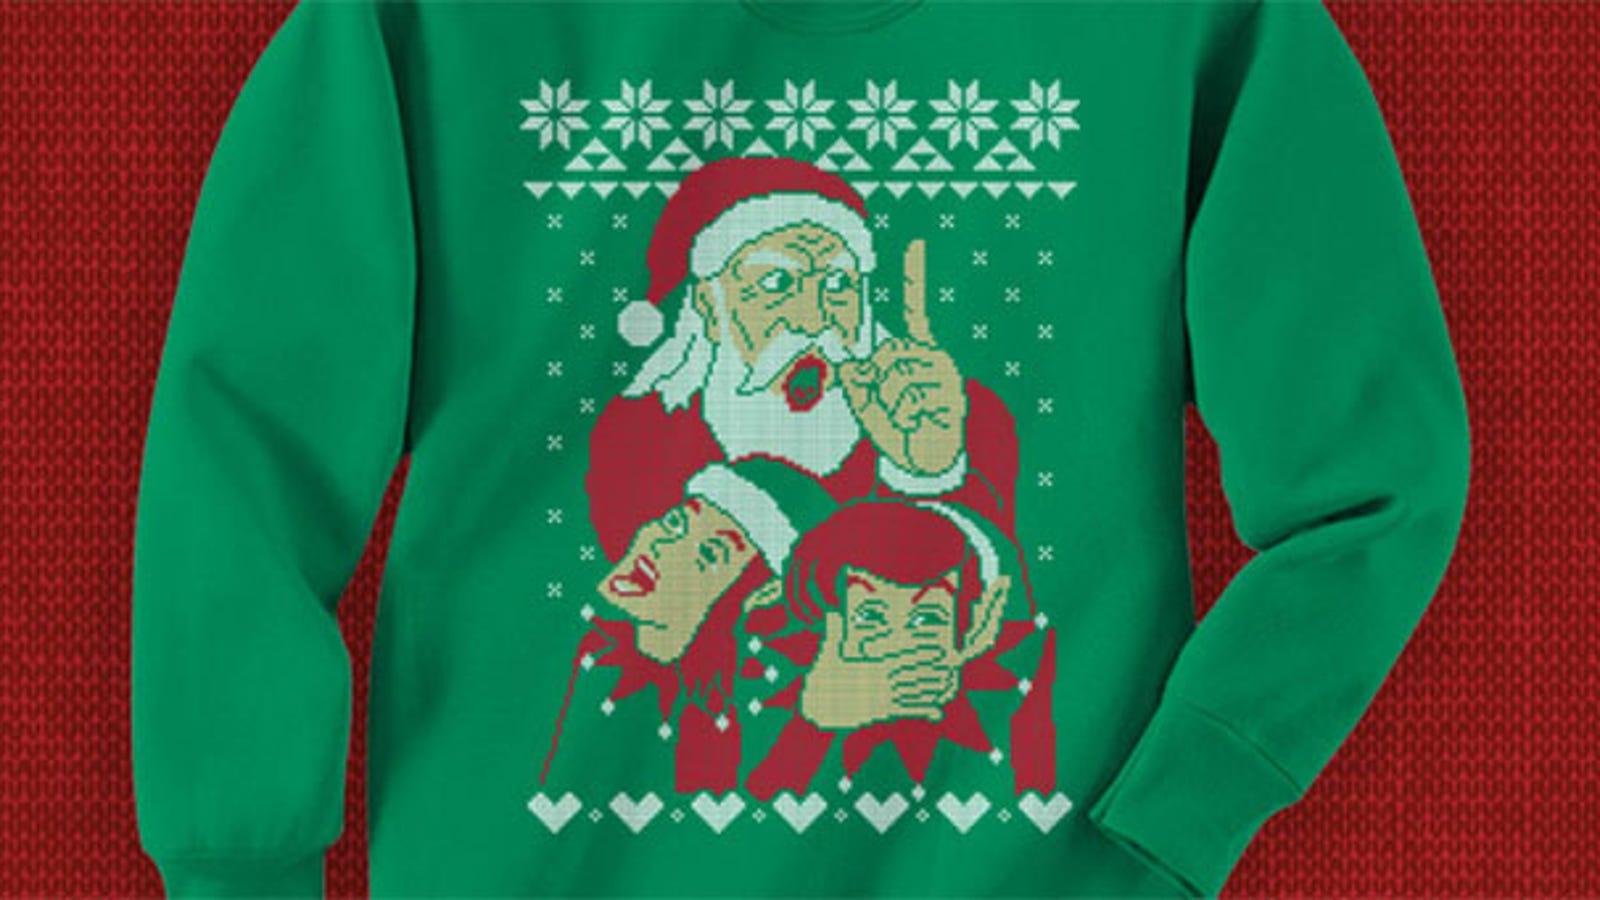 my boy a zelda christmas is a merry christmas - Legend Of Zelda Christmas Sweater